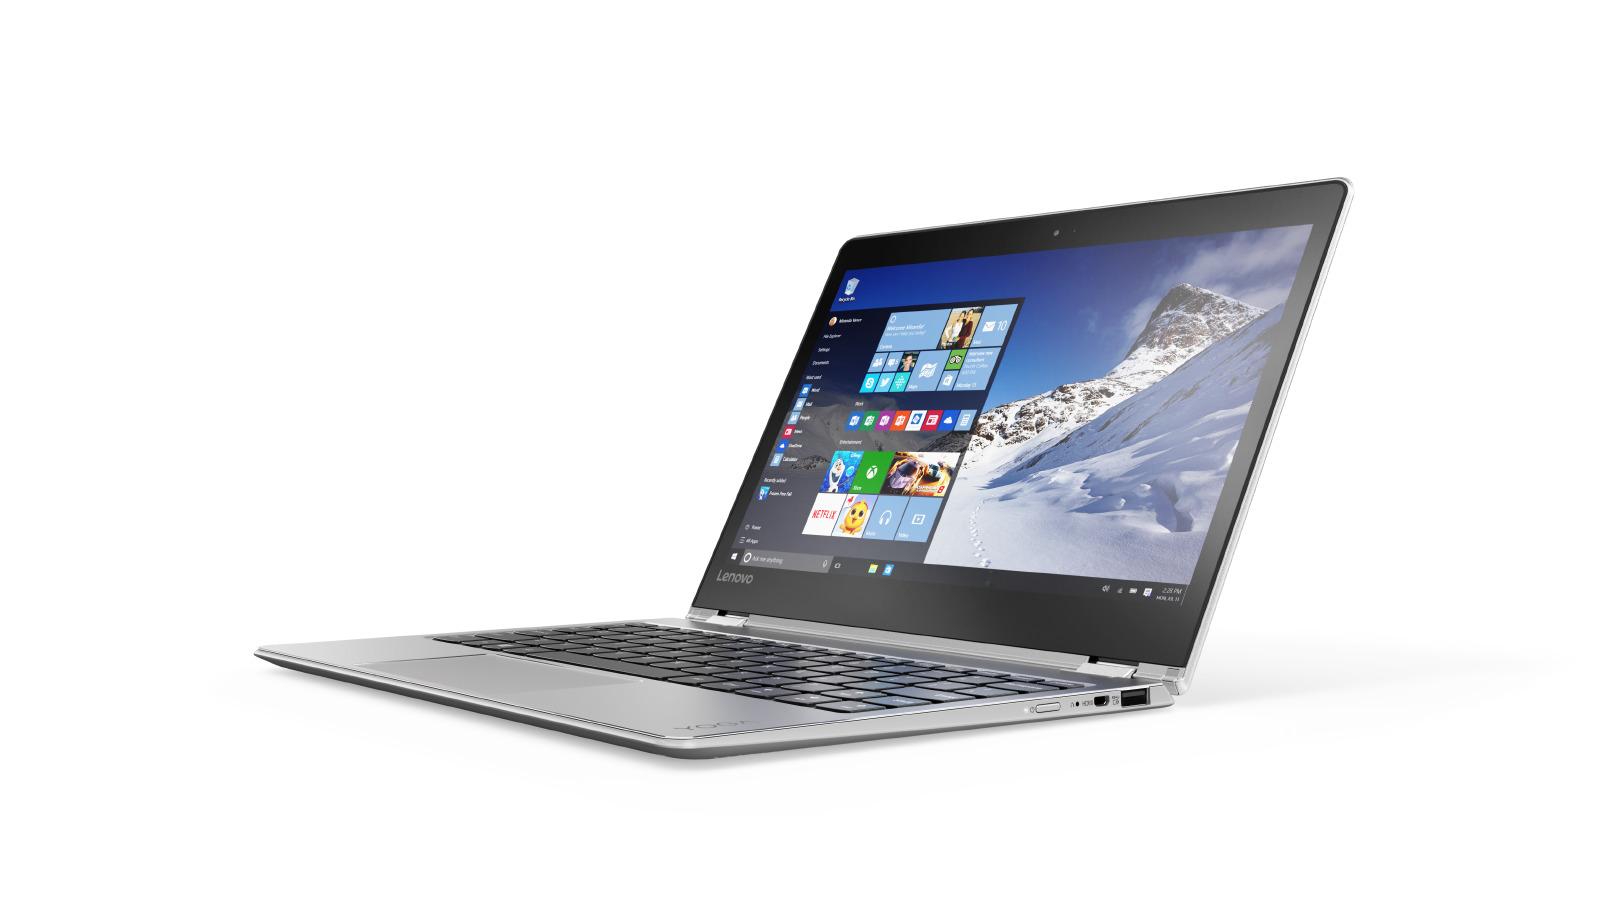 "Lenovo YOGA 710-11IKB Core i5-7Y54 3,20GHz/8GB/SSD 256GB/11,6"" FHD/IPS/multitouch/WIN10 PRO stříbrná 80V60021CK"